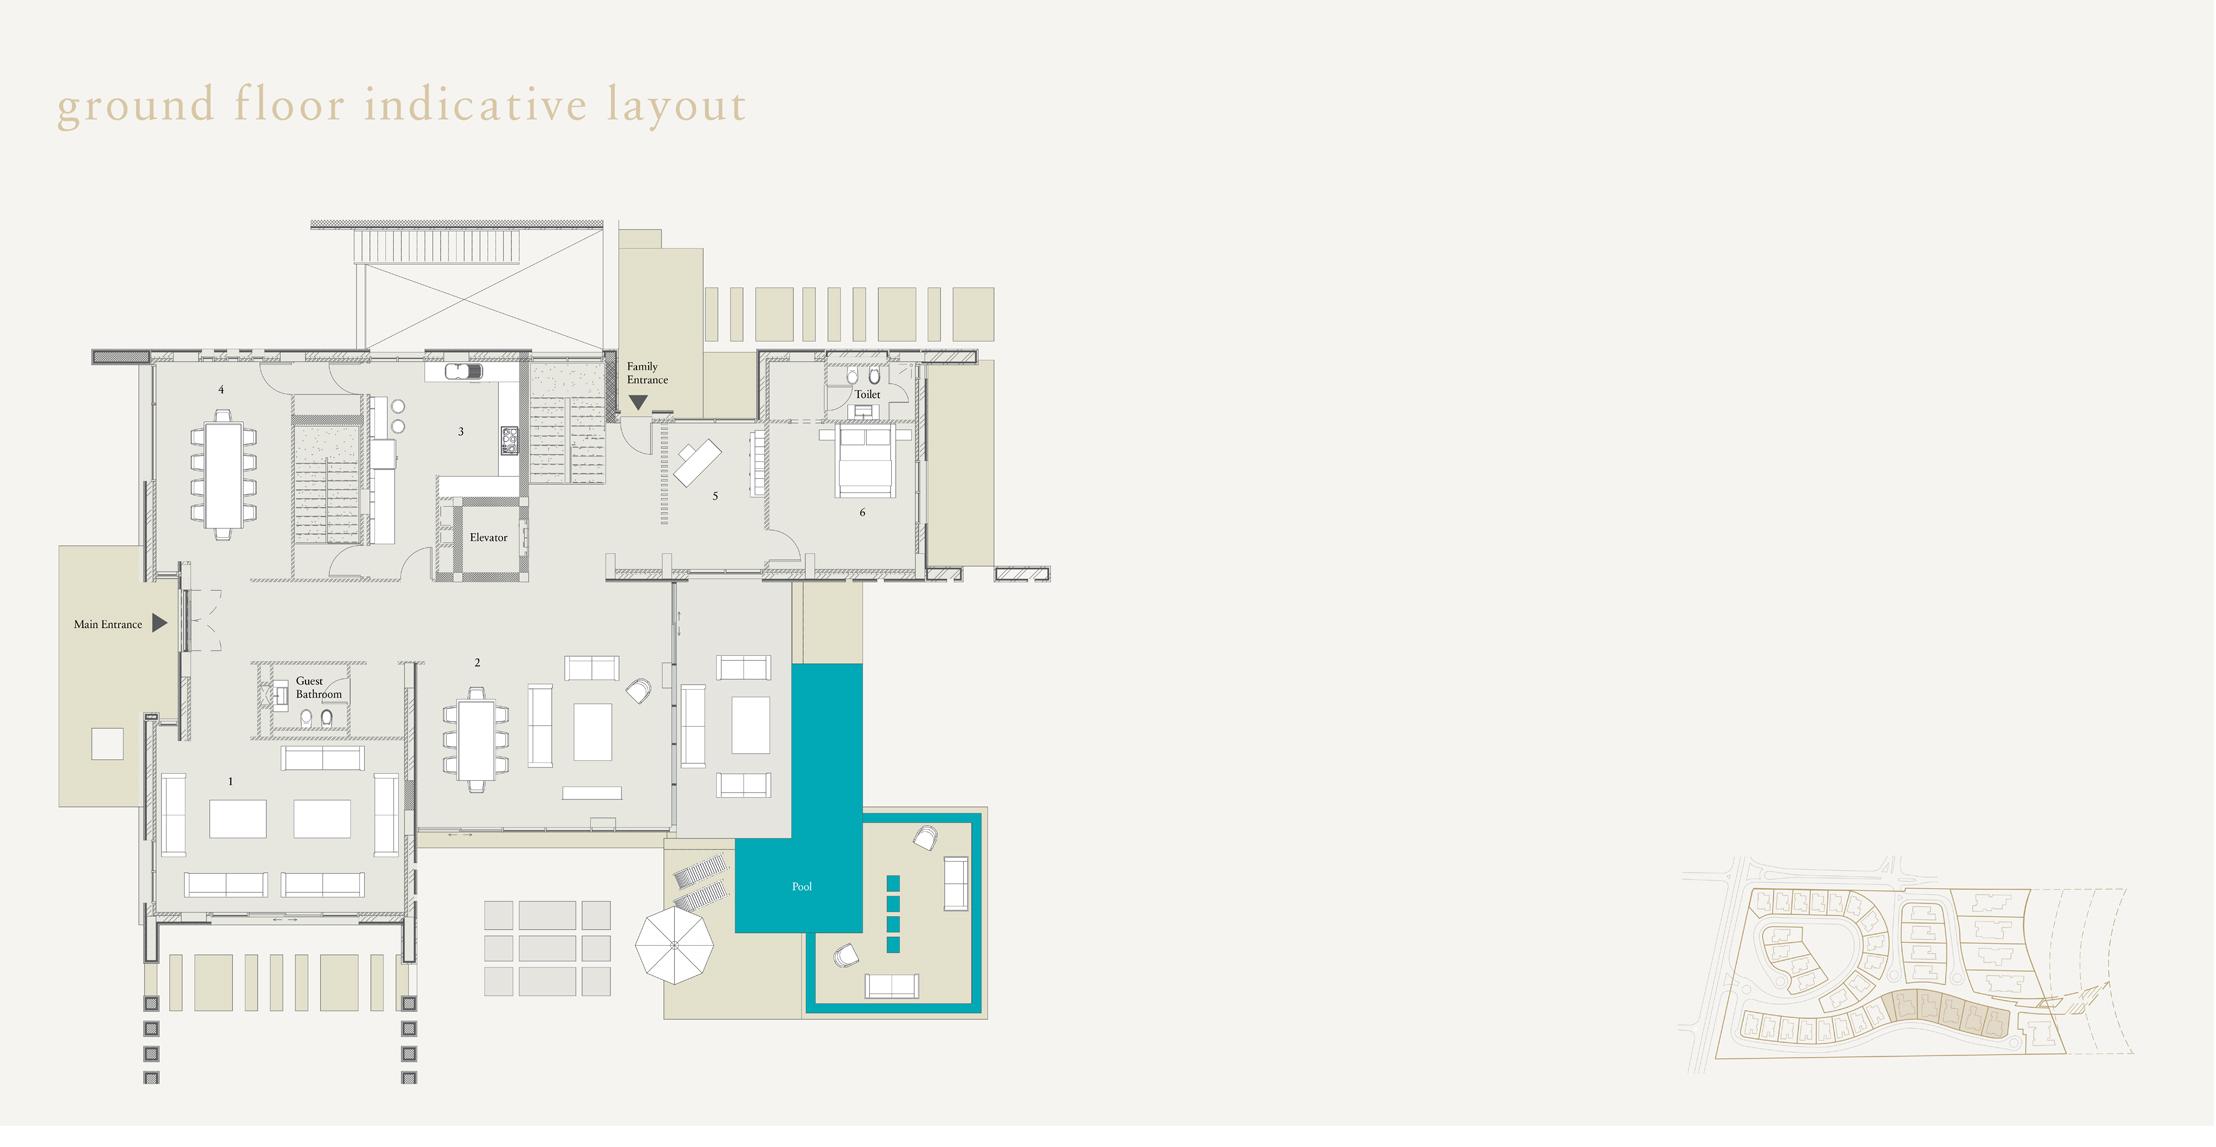 Ground Floor Inductive Layout